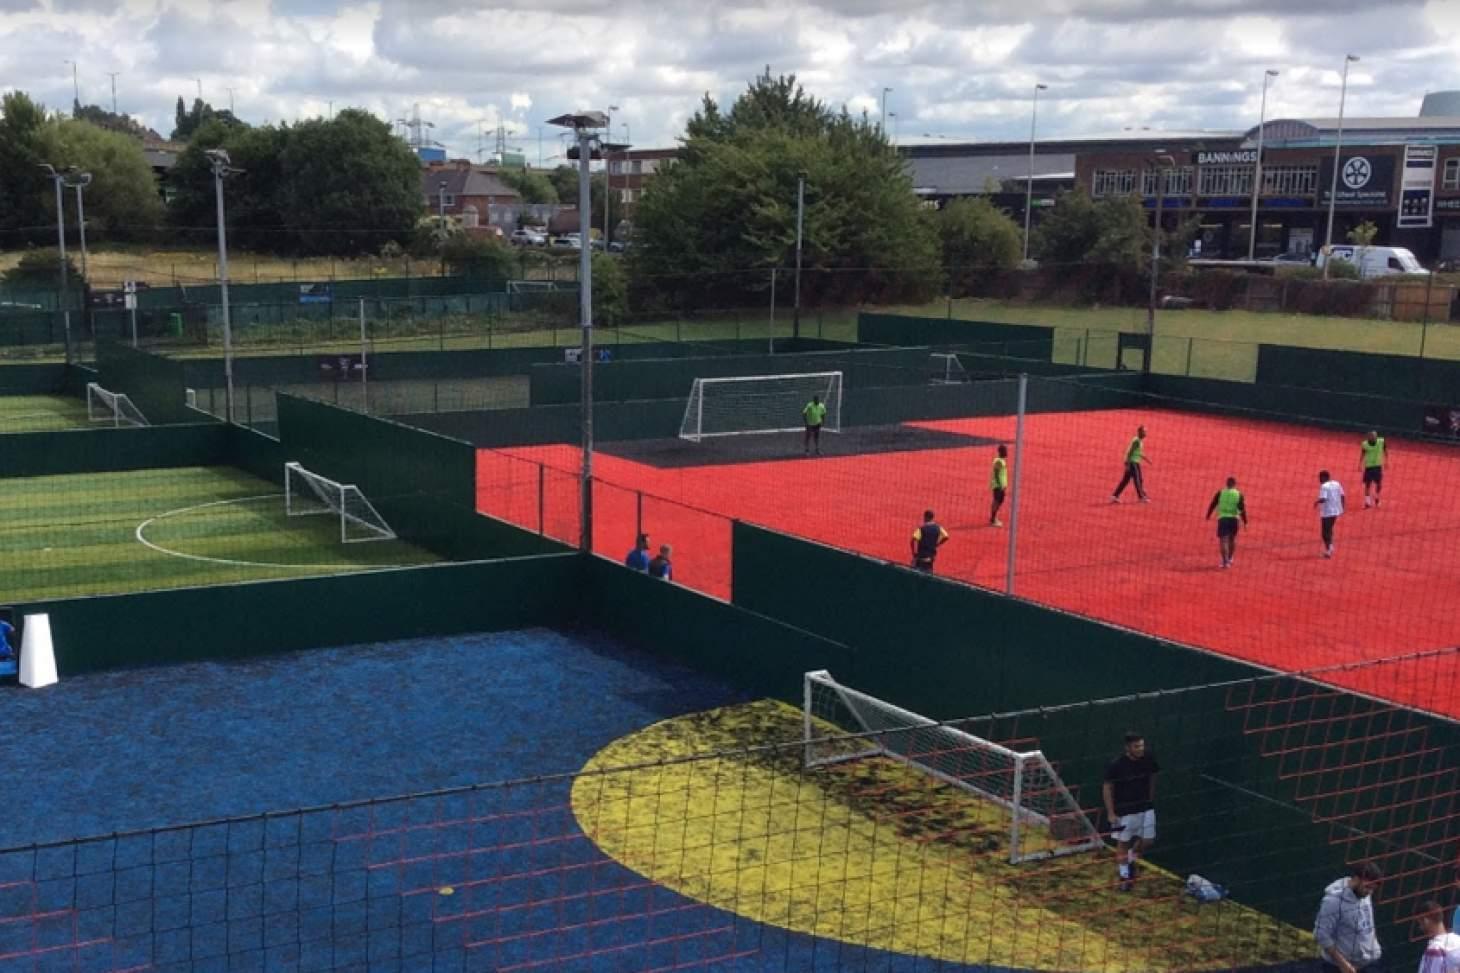 Powerleague Birmingham 7 a side | 3G Astroturf football pitch